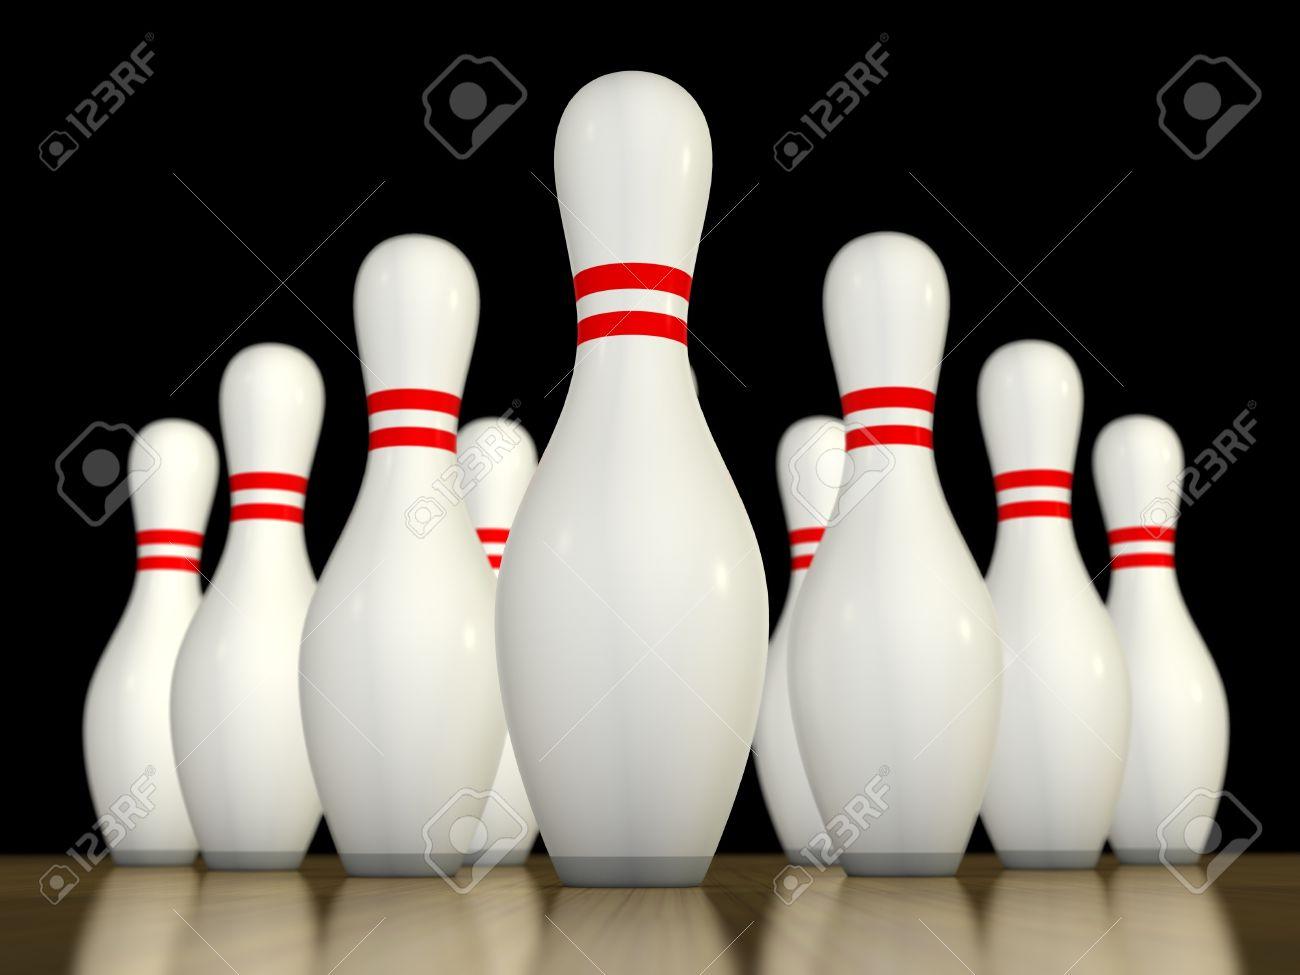 Ten Pin Bowling Pins Bereit, Rollte über Lizenzfreie Fotos, Bilder ...